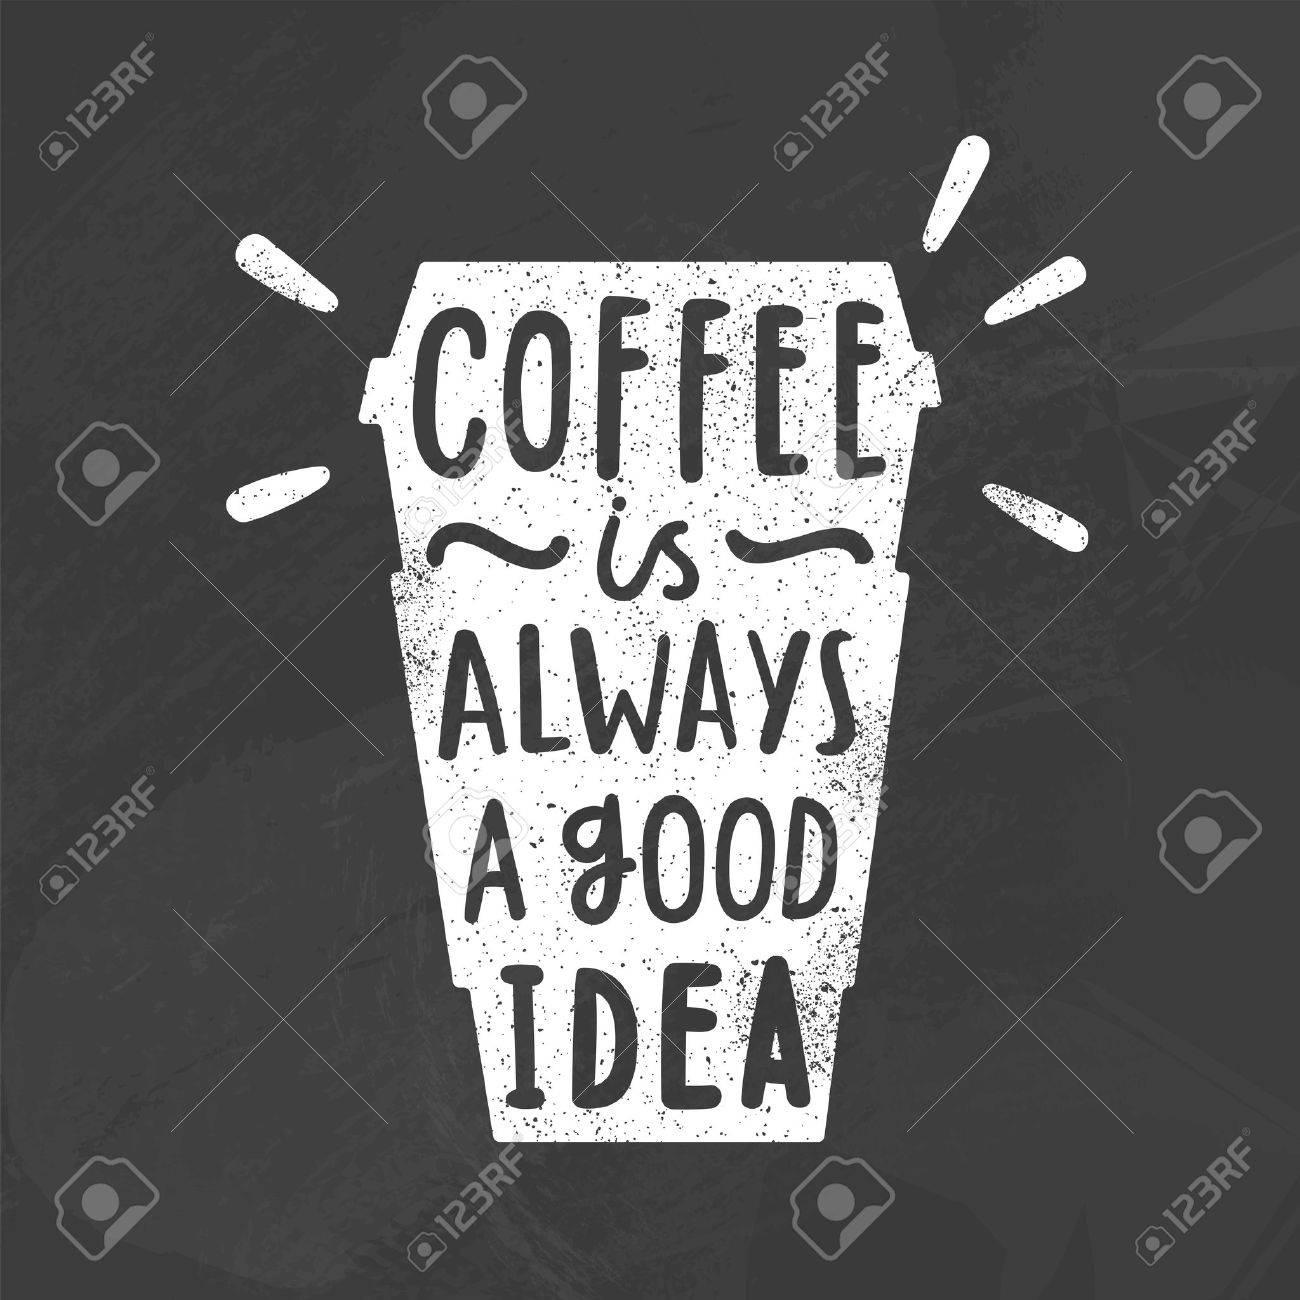 Coffee is always a good idea. Vector hand drawn chalk illustration - 73885819